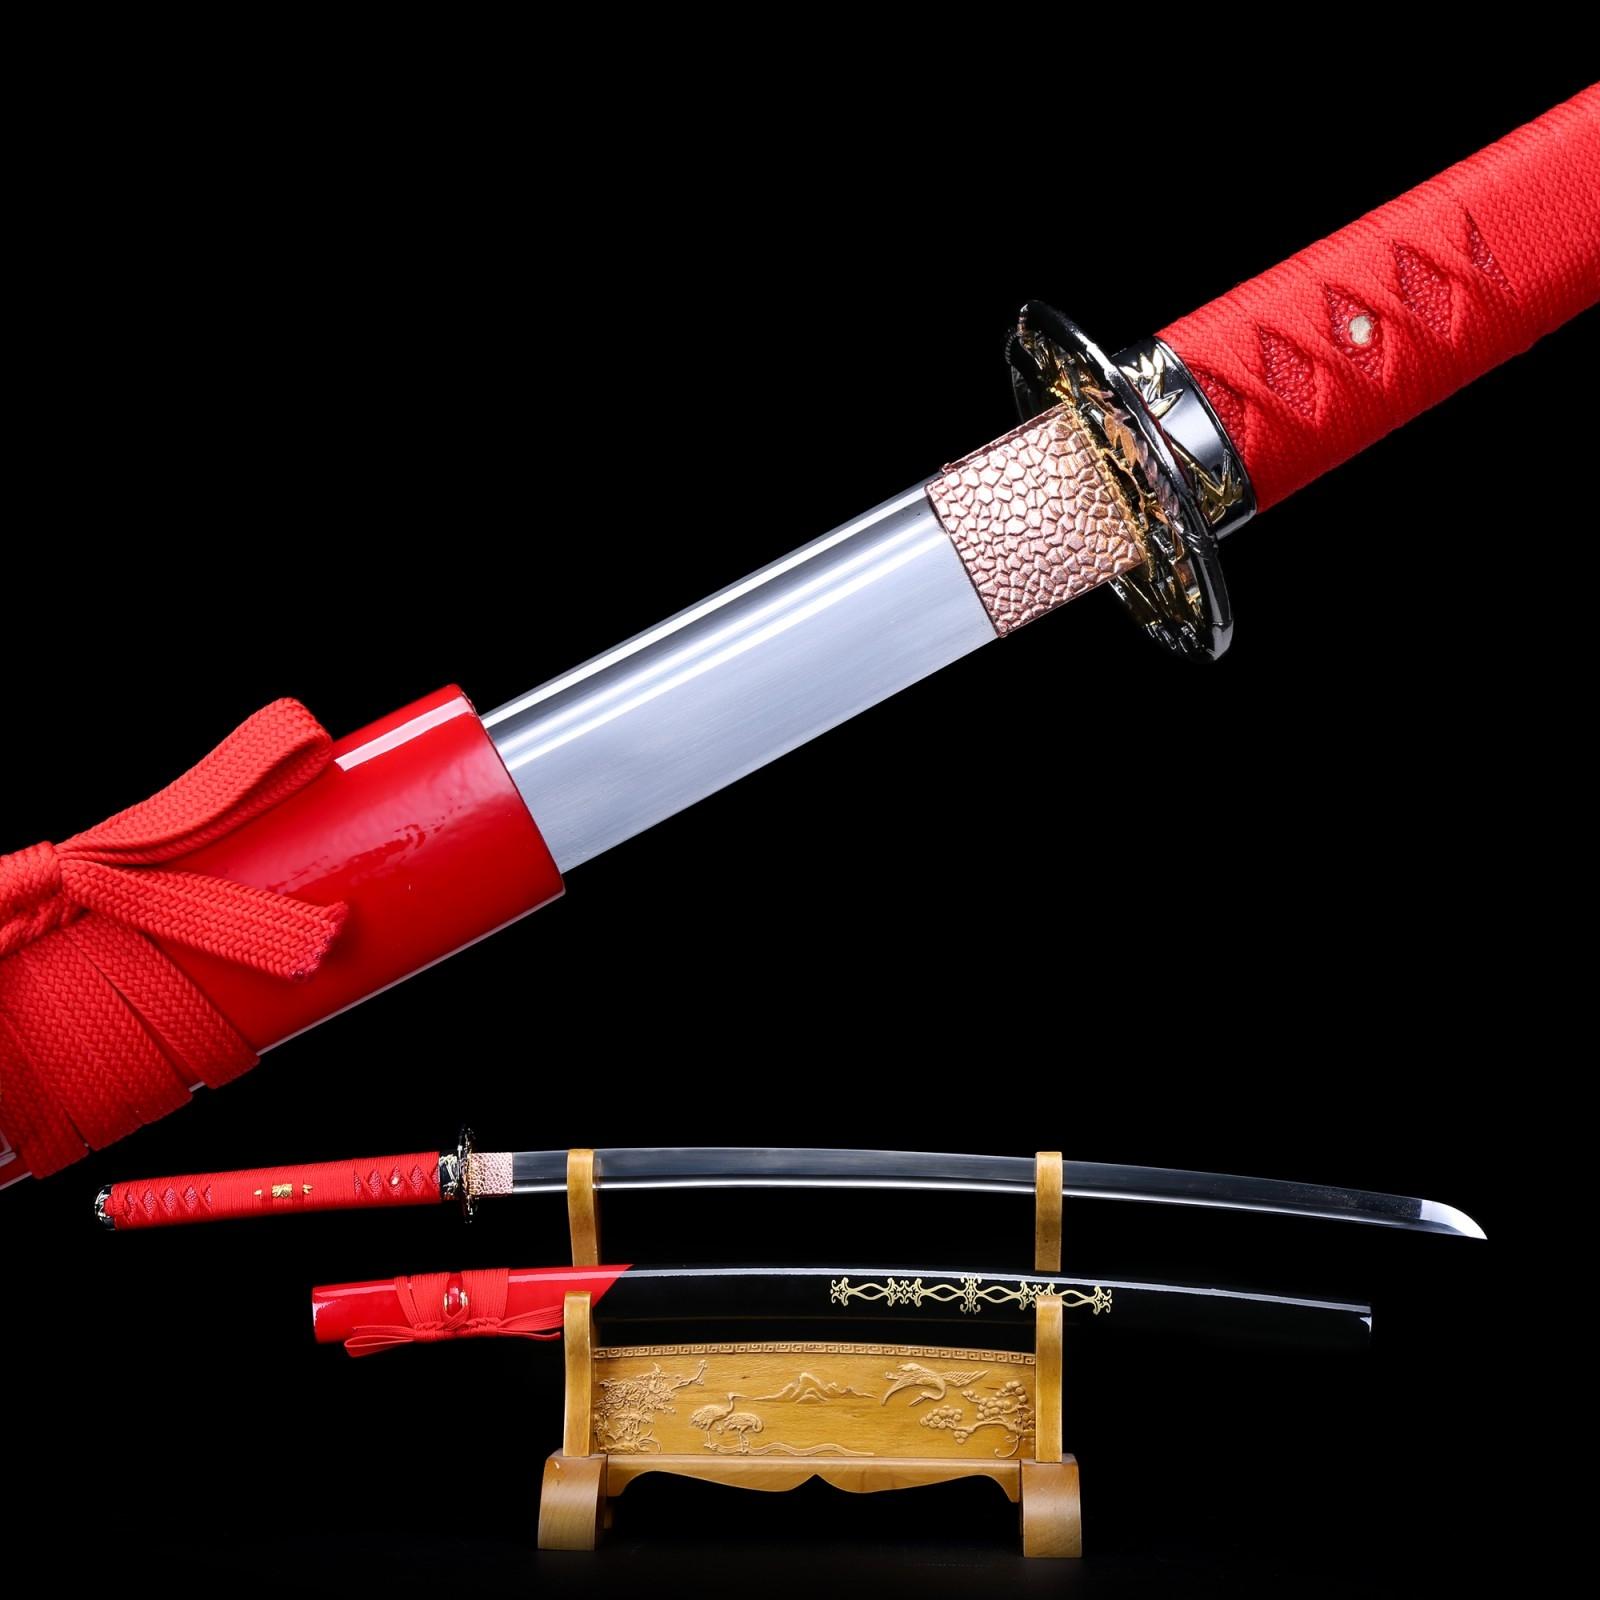 Handmade Spring Steel Flower Tsuba Red Mix Saya Katana Japanese Samurai Swords